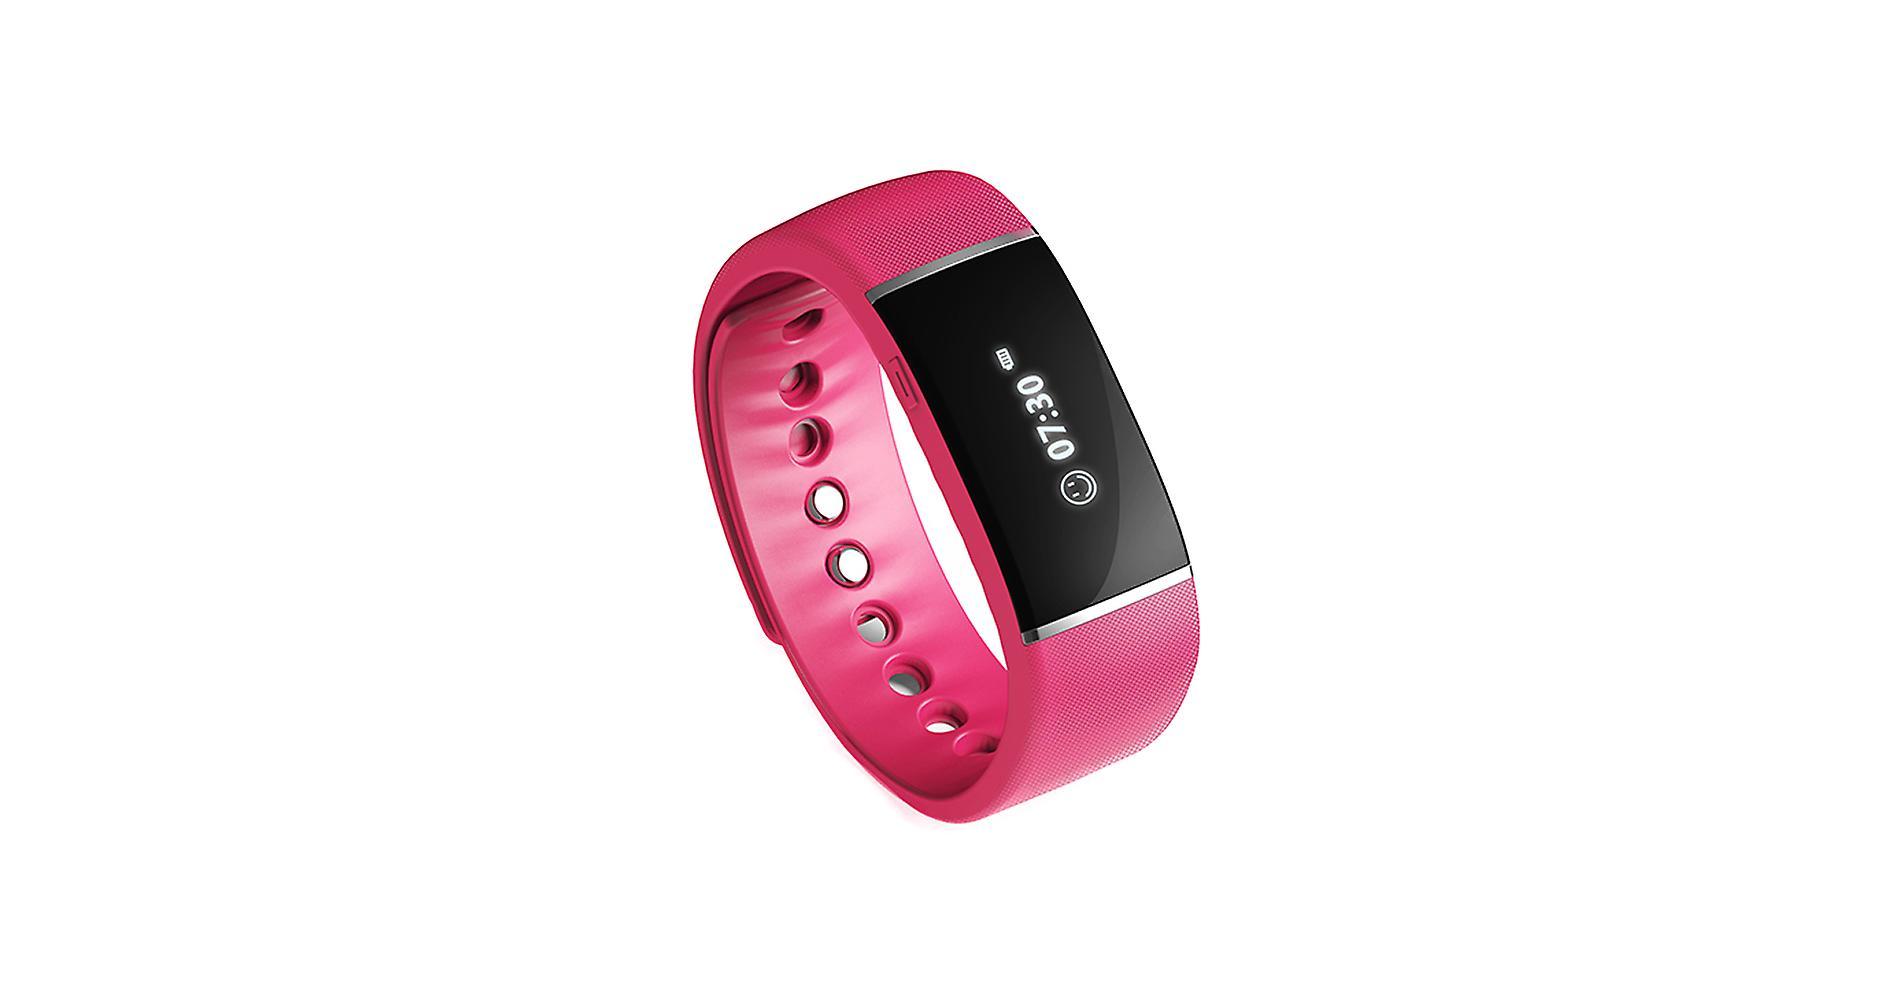 Cordless Multifunction Smart Watch